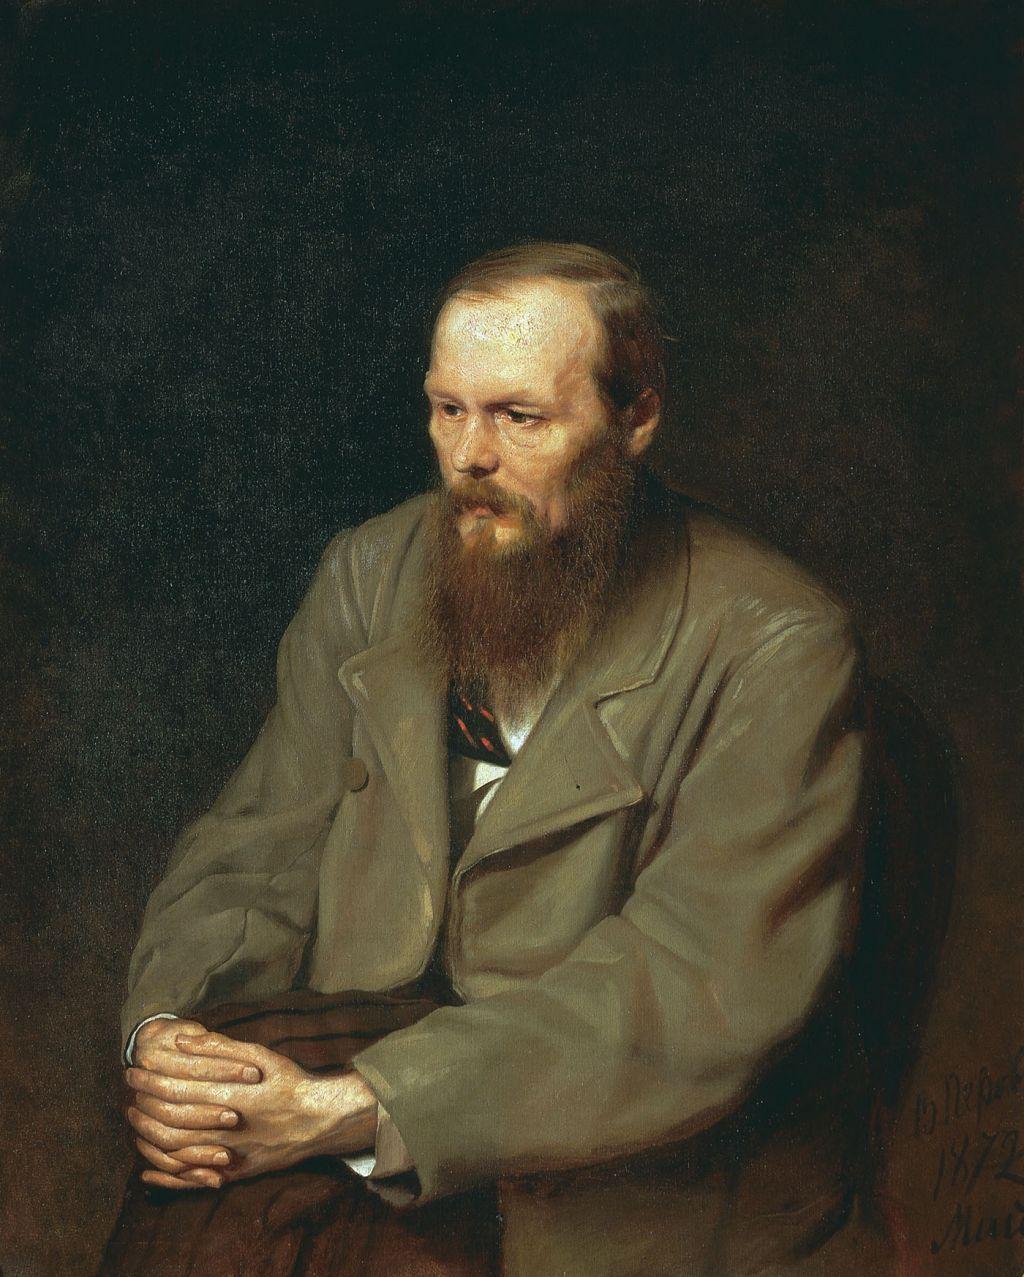 Doubles of Raskolnikov in the novel of F. M. Dostoevsky Crime and Punishment 97